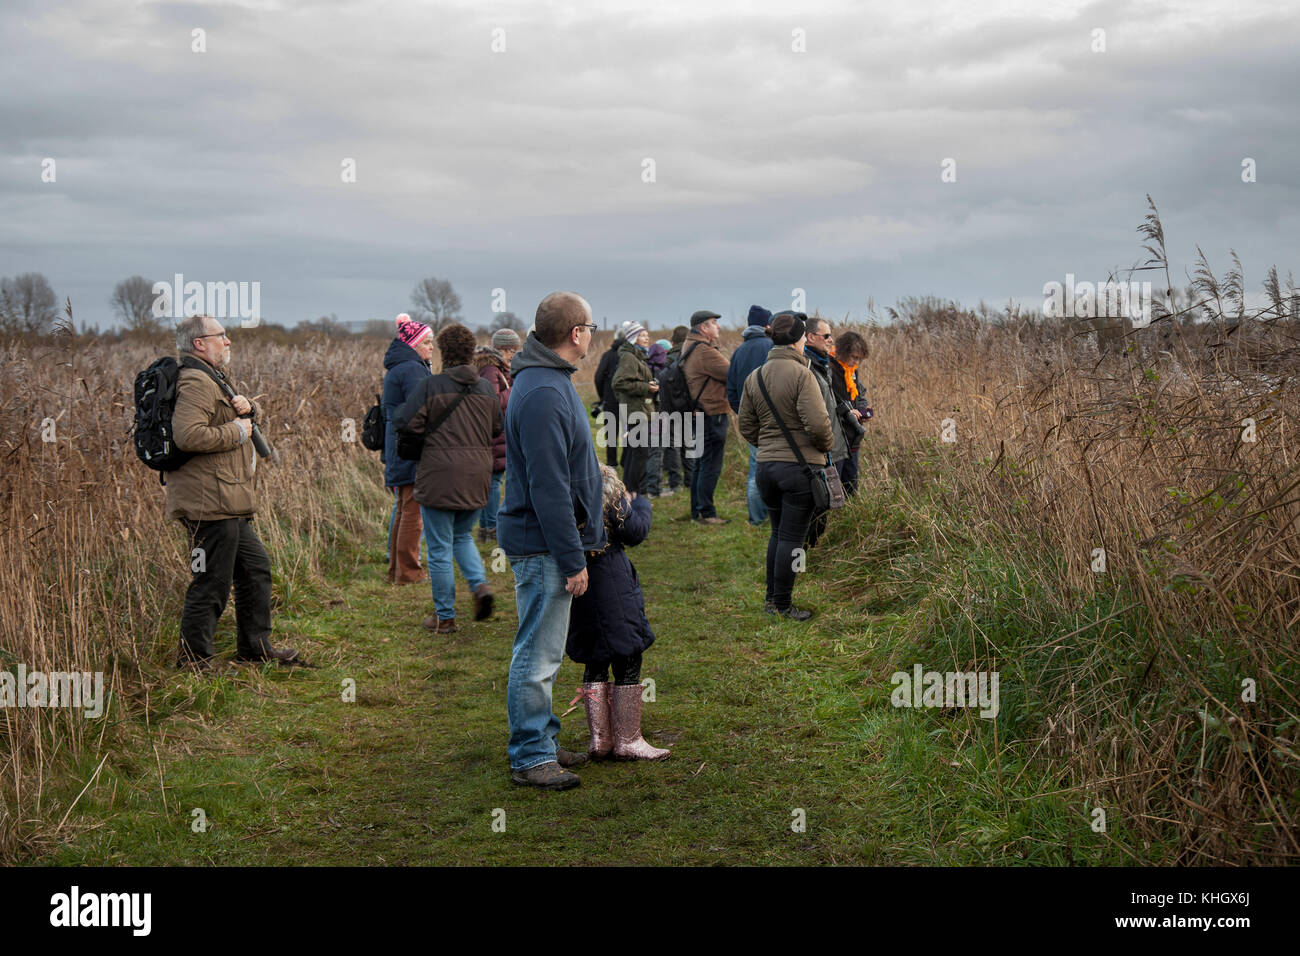 Birdwatching, or birding, birders, wildlife observation binoculars, scopes, optics, tripods at Burscough, Lancashire, Stock Photo